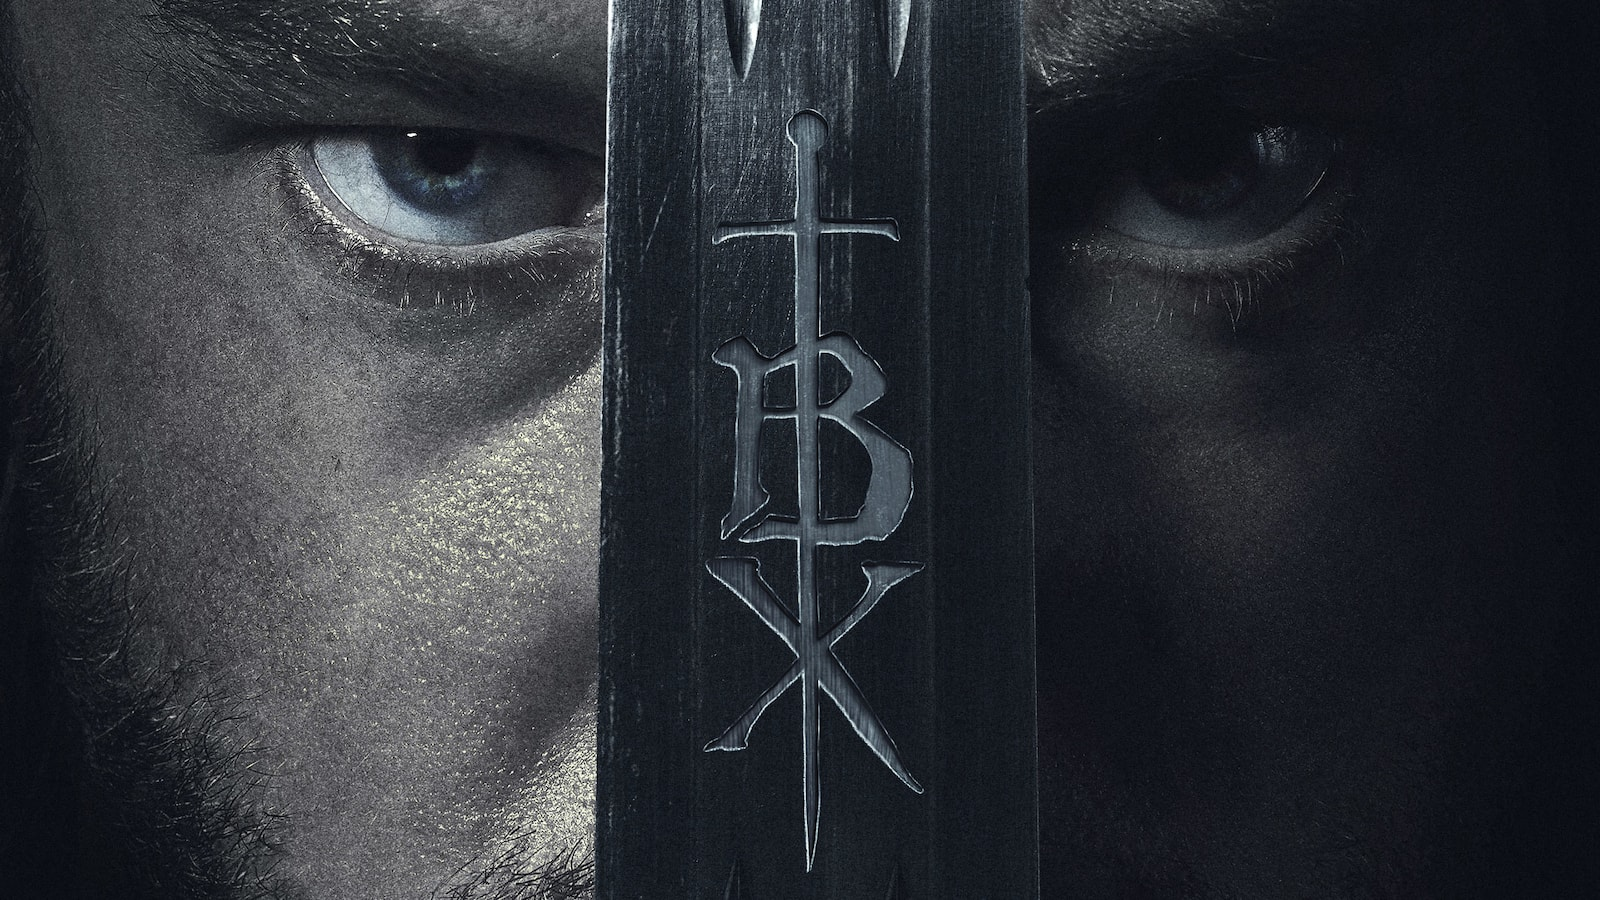 bastard-executioner-the